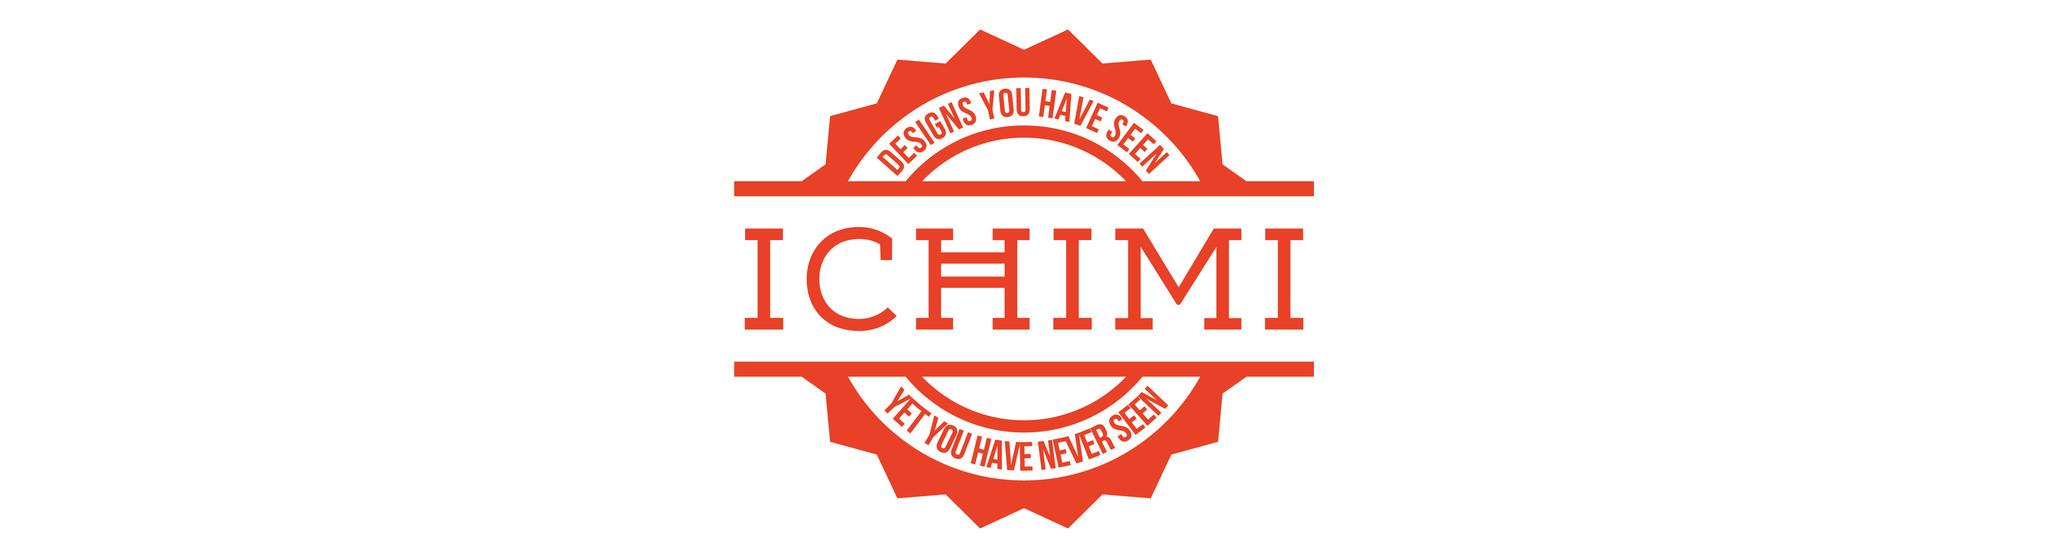 ICHIMI